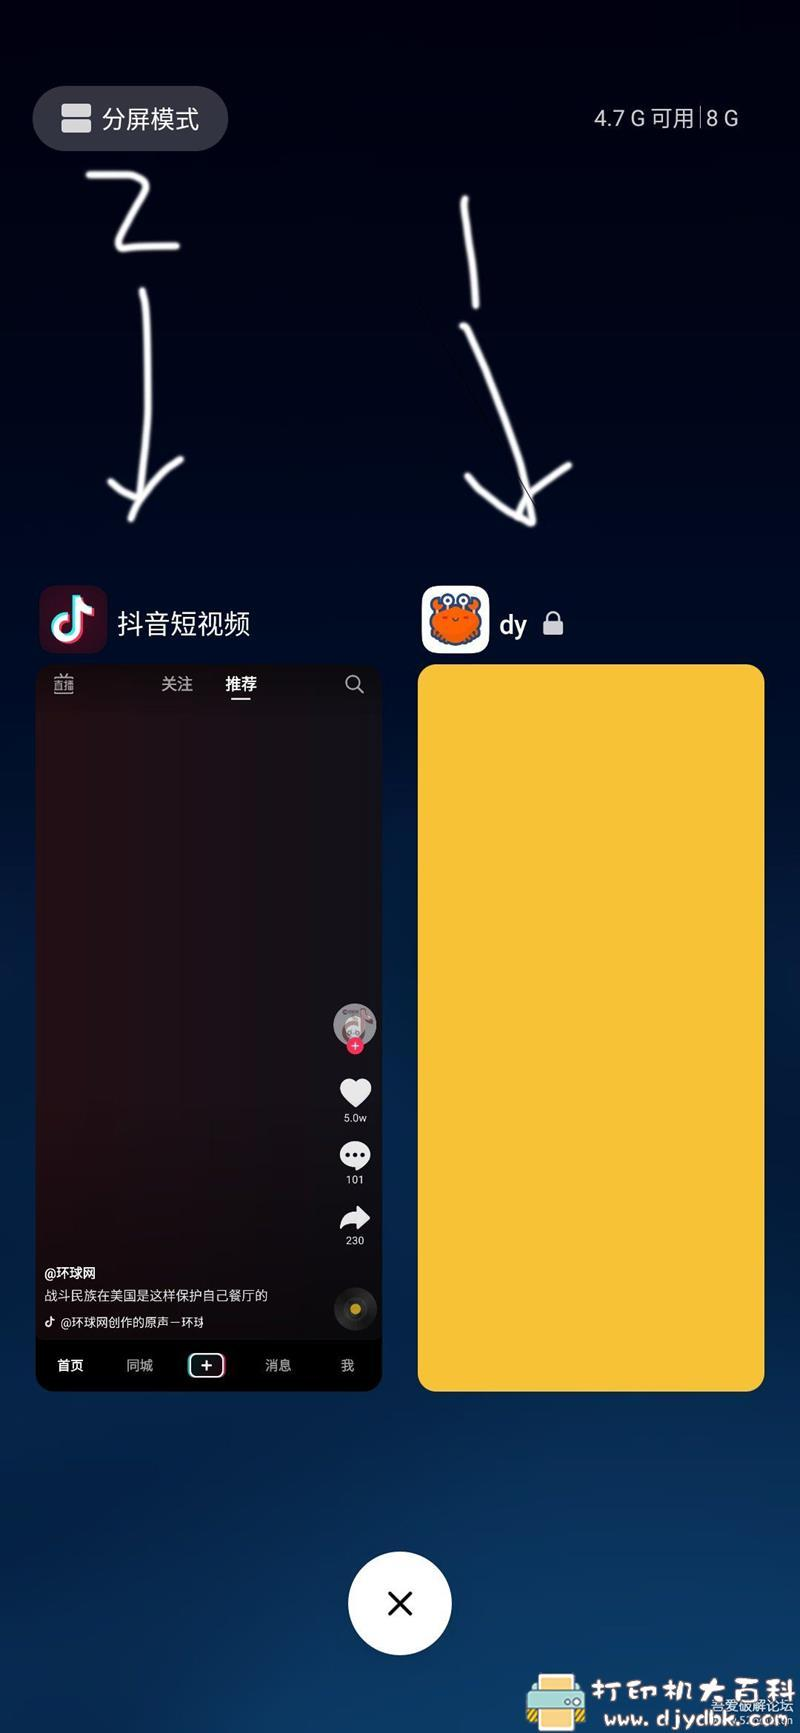 [Android]抖音解析工具,dy 1.0图片